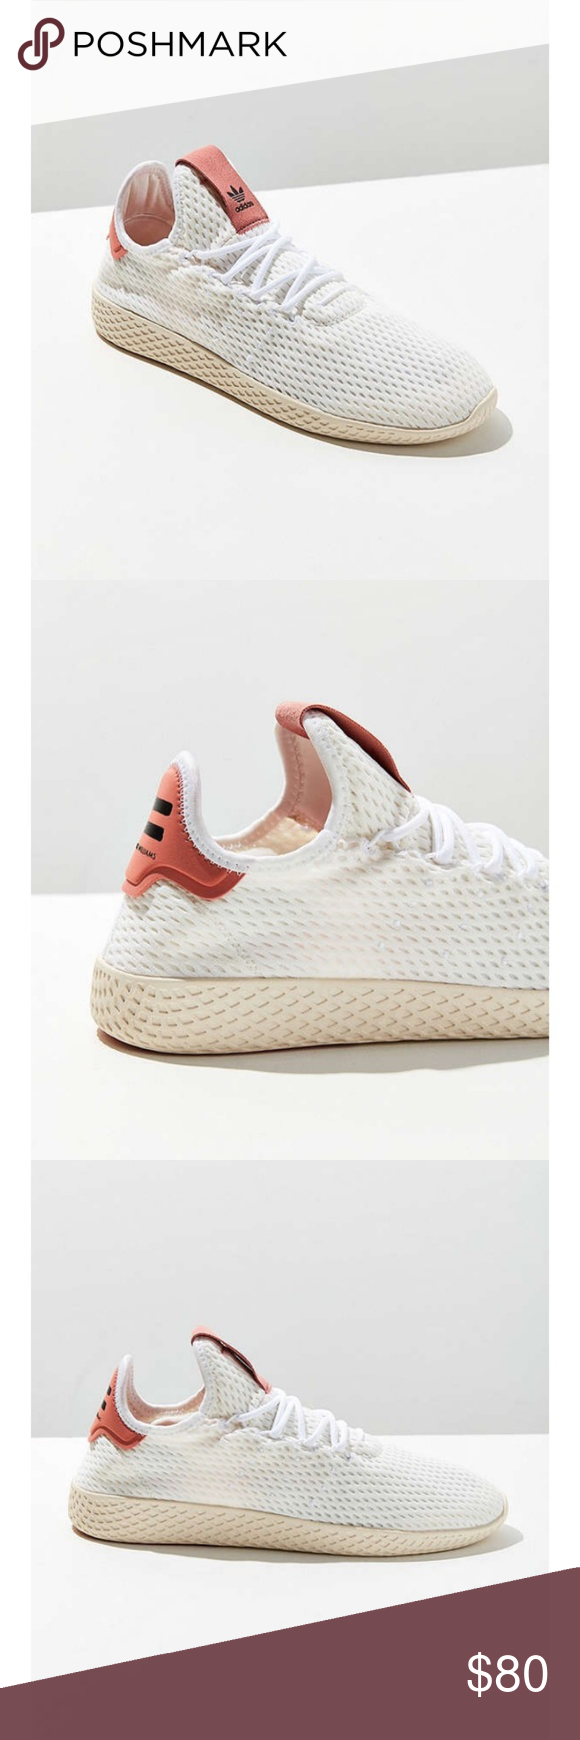 Adidas Original X Pharrell Sneaker W M 8 NWT  